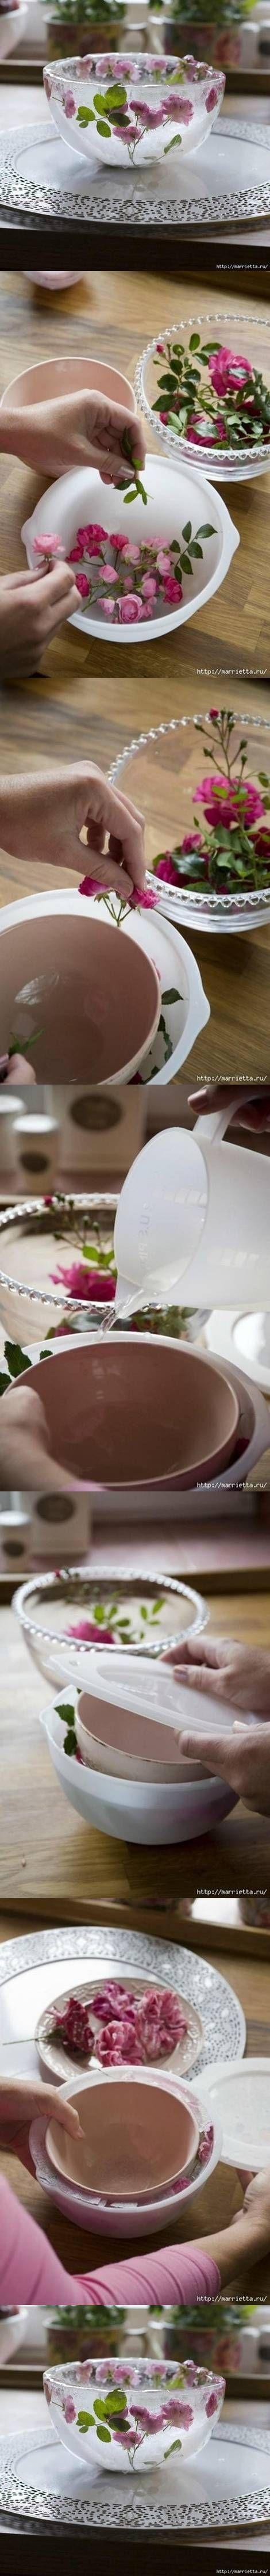 DIY Flower Bowl diy craft crafts diy crafts how to tutorial home crafts